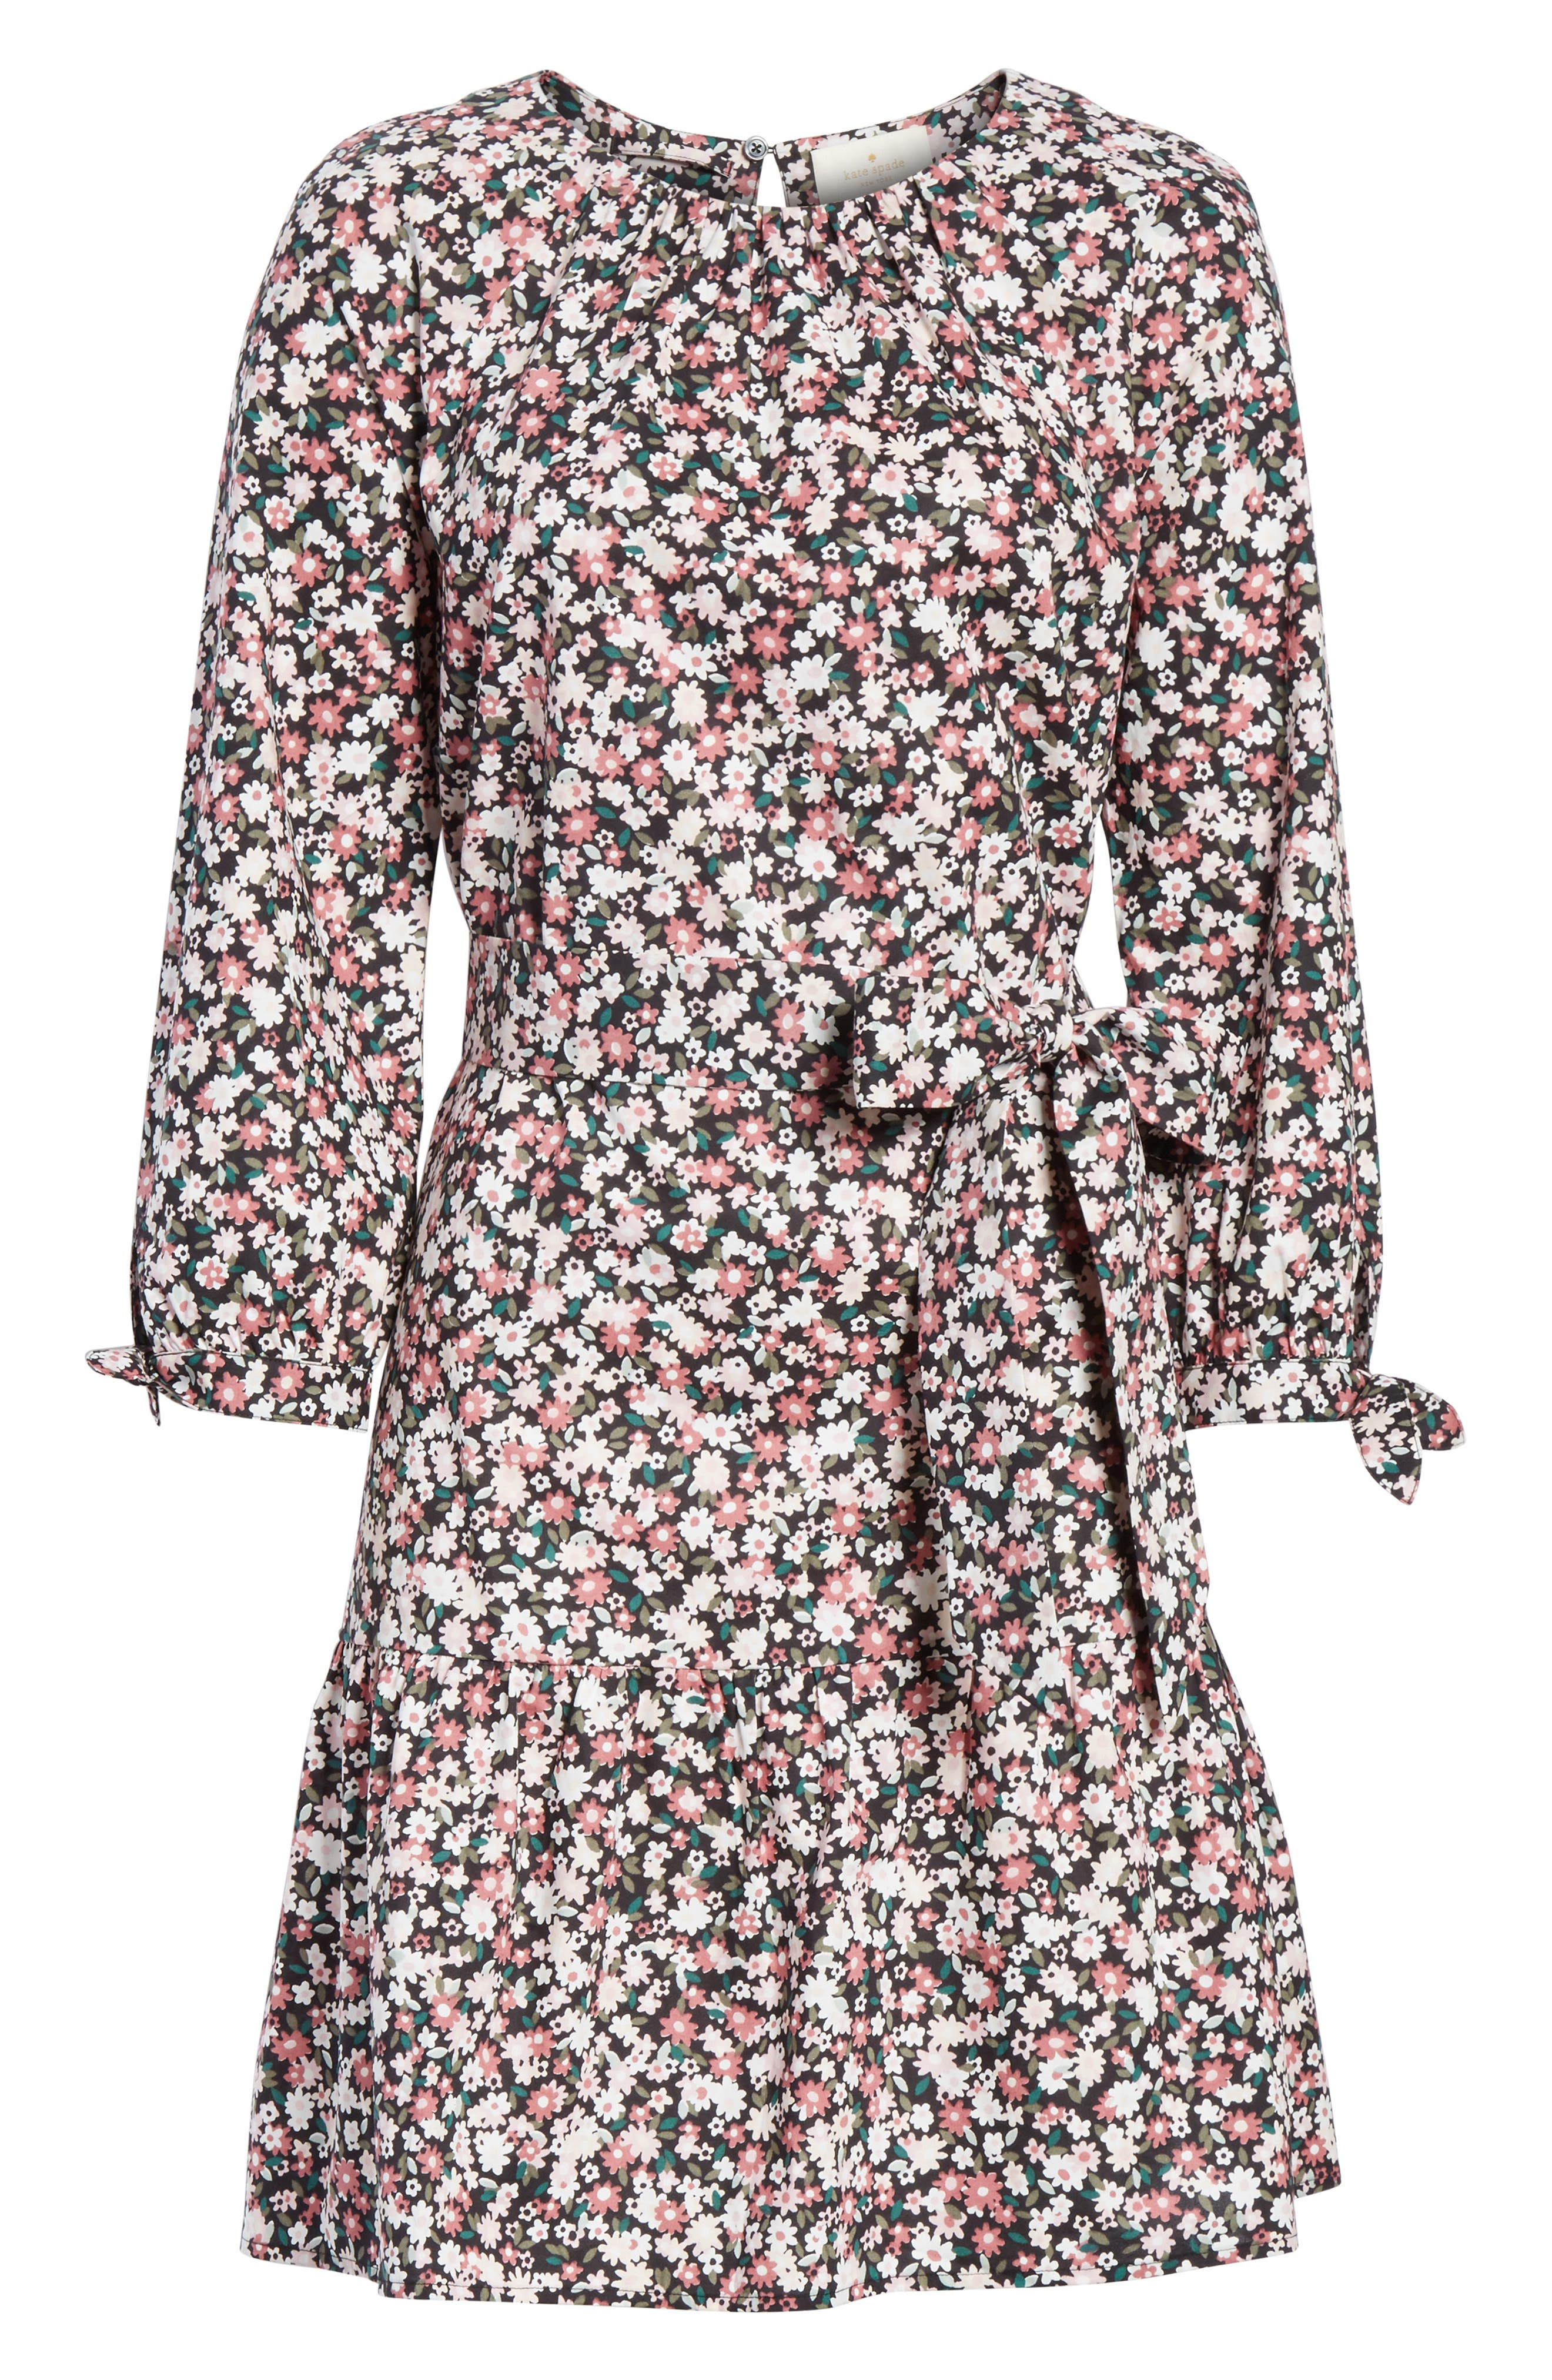 wildflower poplin dress,                             Alternate thumbnail 6, color,                             Black